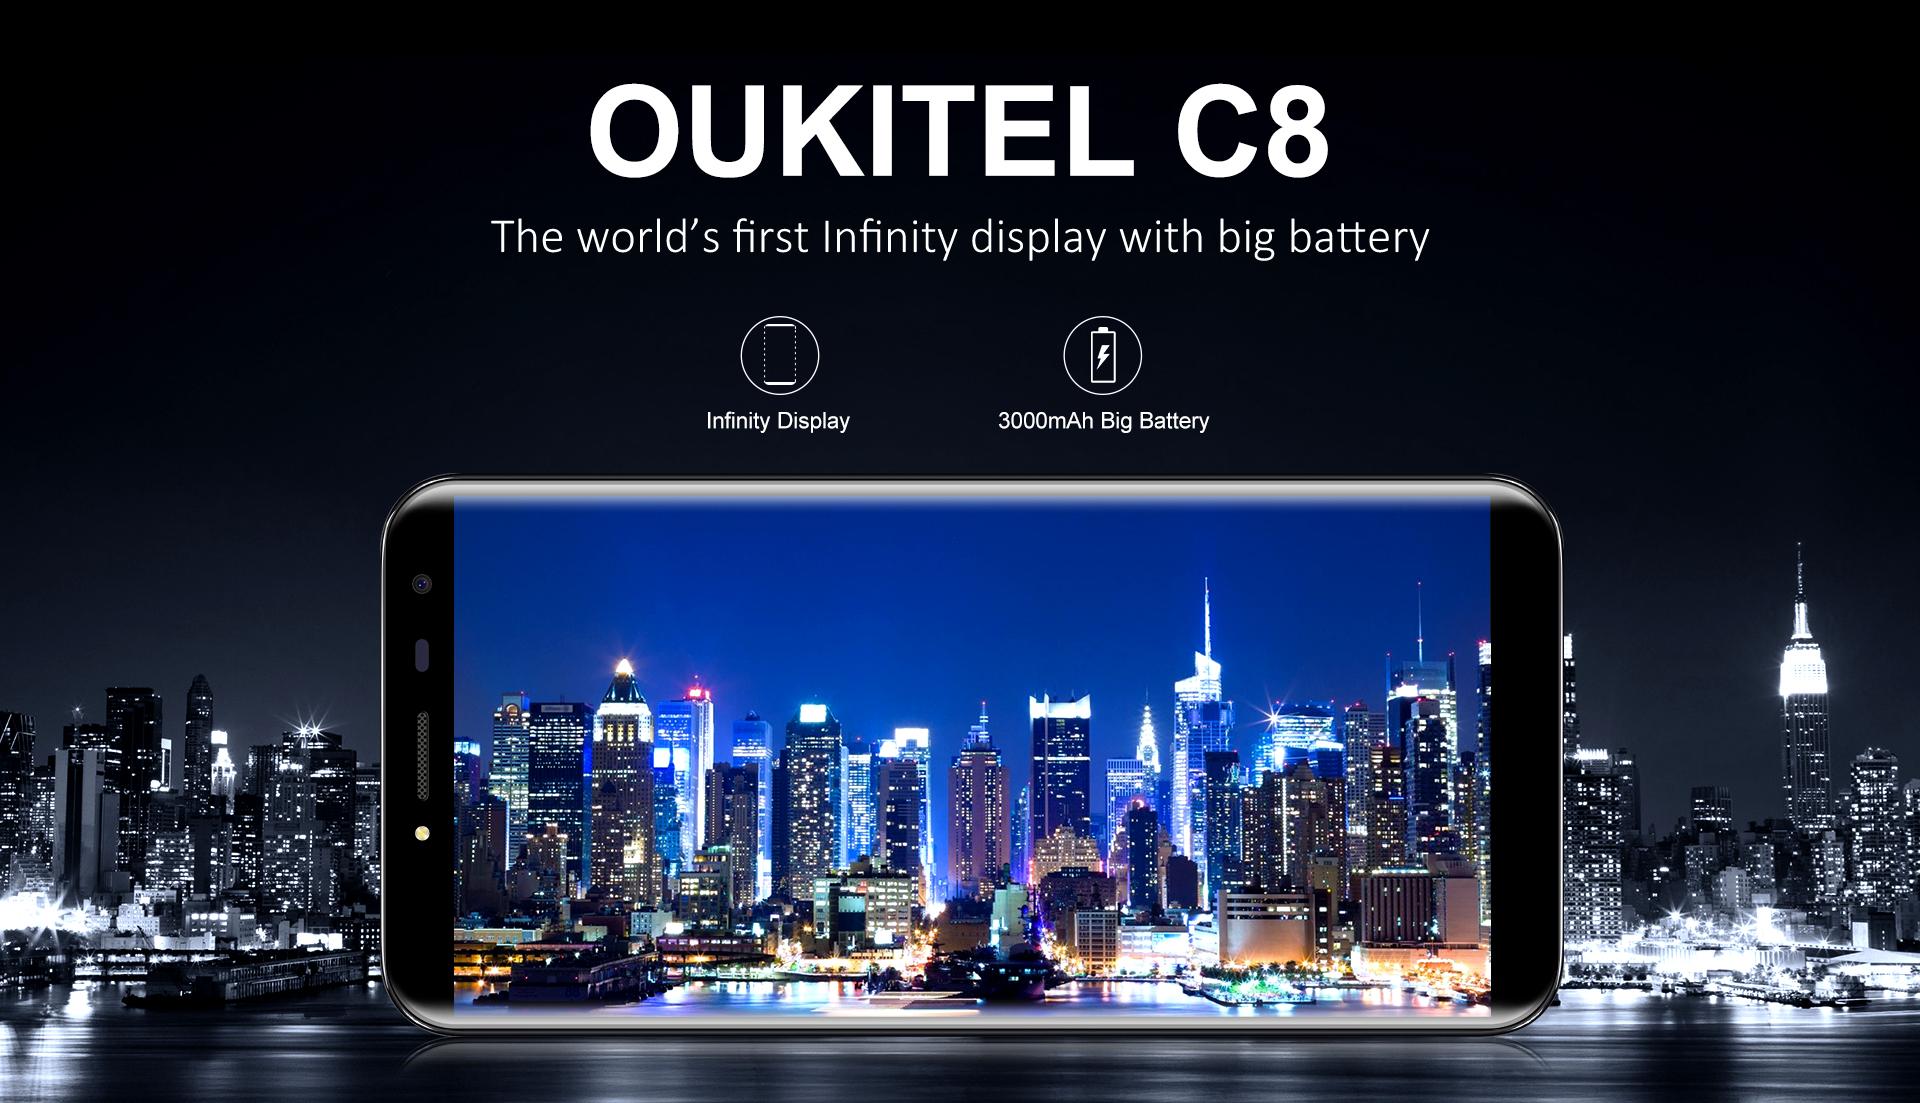 Display oukitel c8